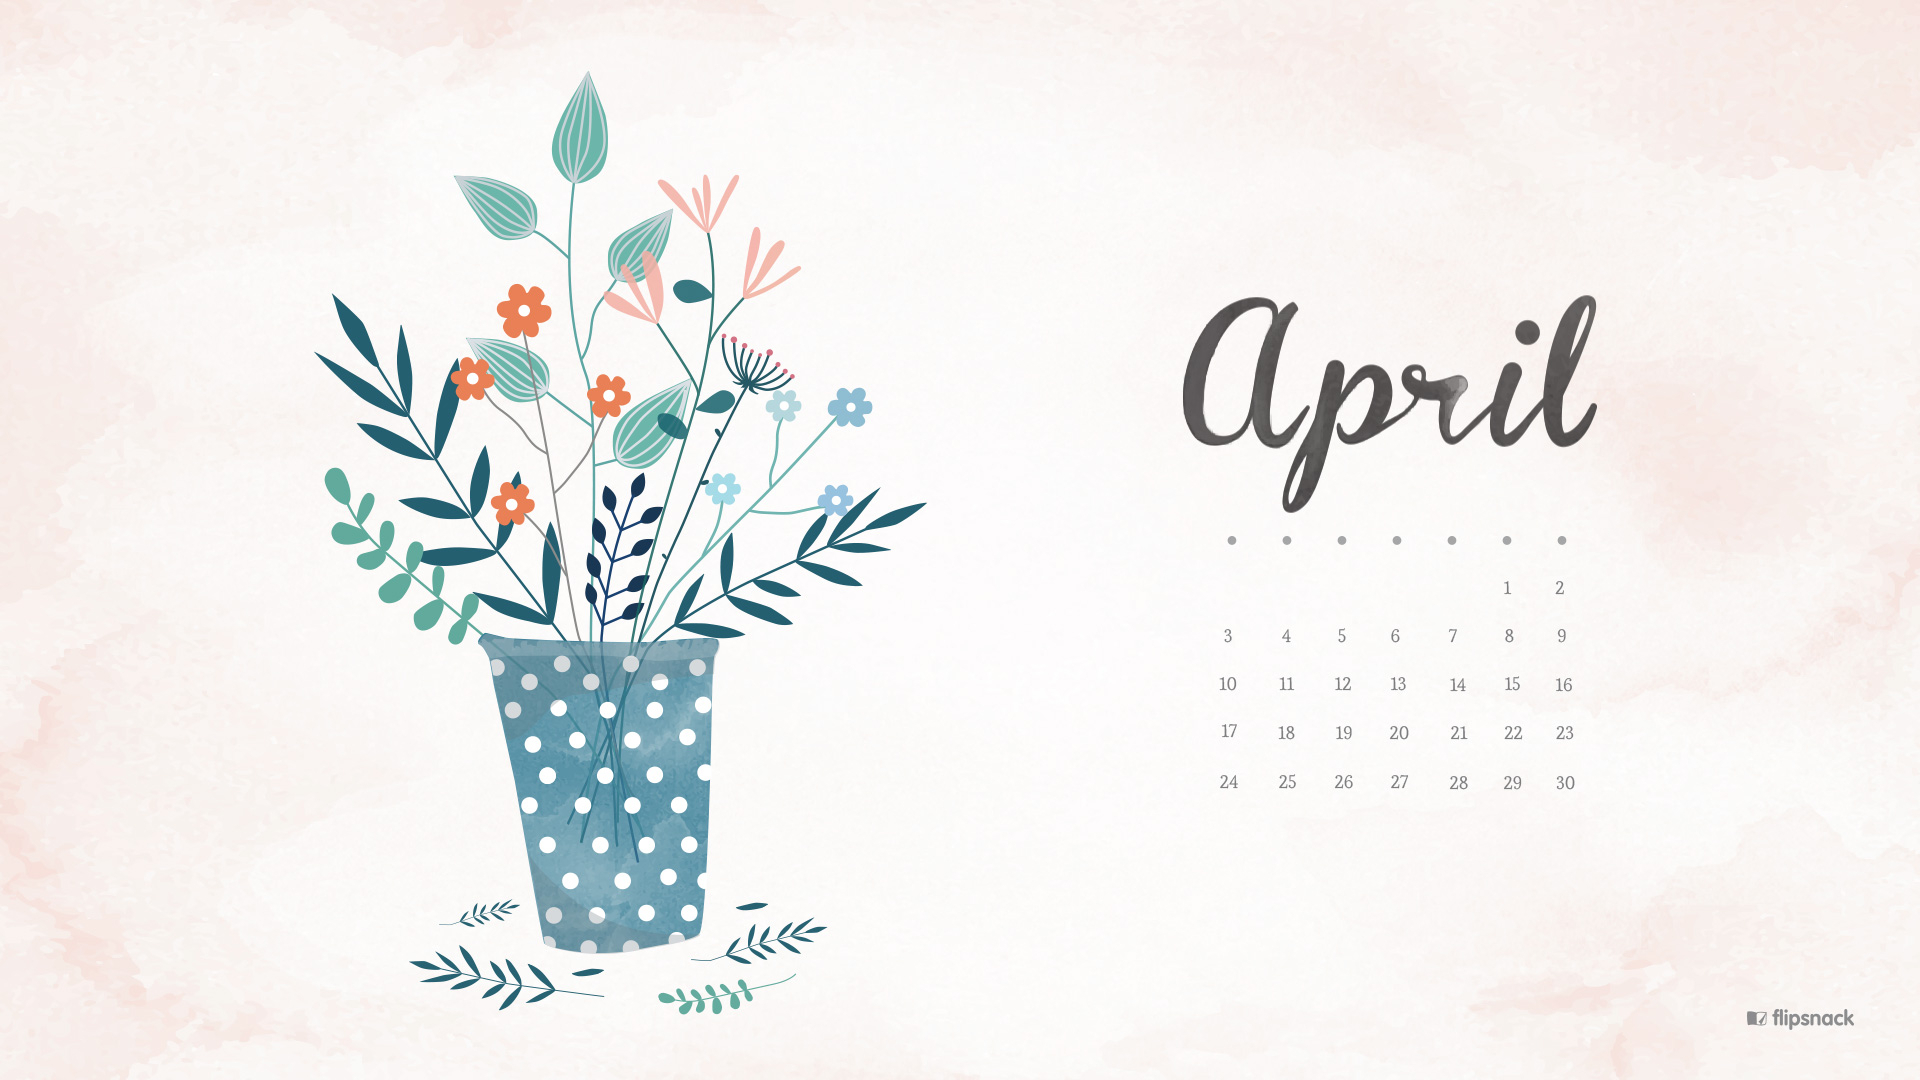 April 2016 Free Calendar Wallpaper – Desktop Background